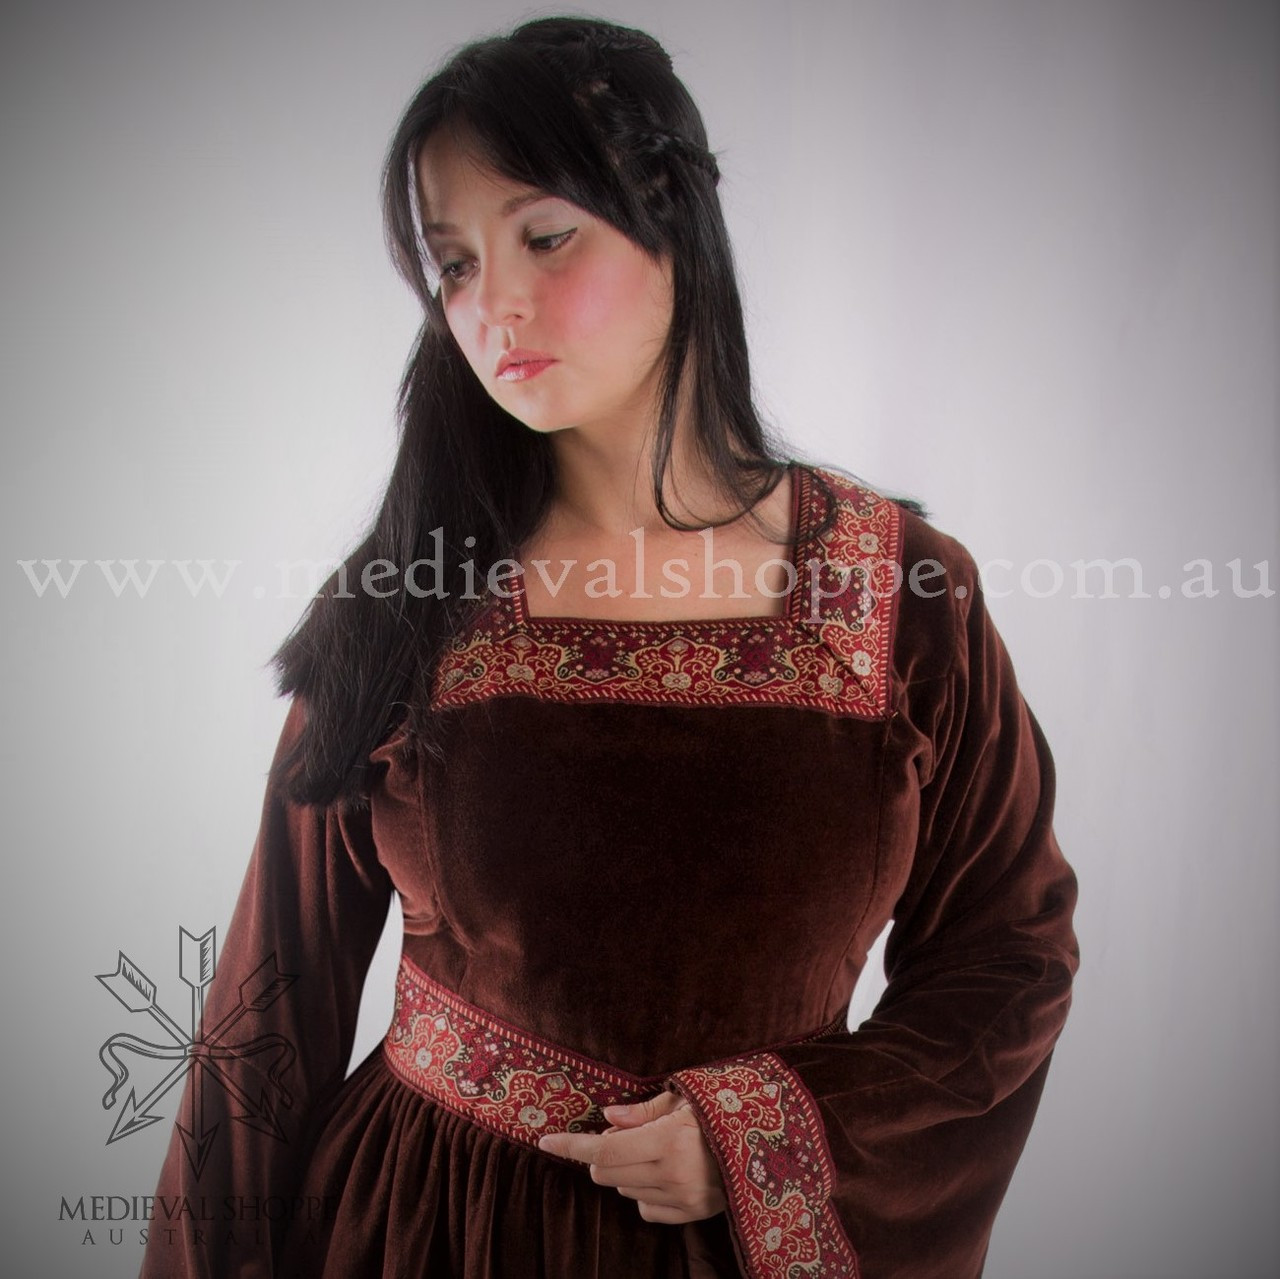 Medieval Renaissance Dress  AUSTRALIA